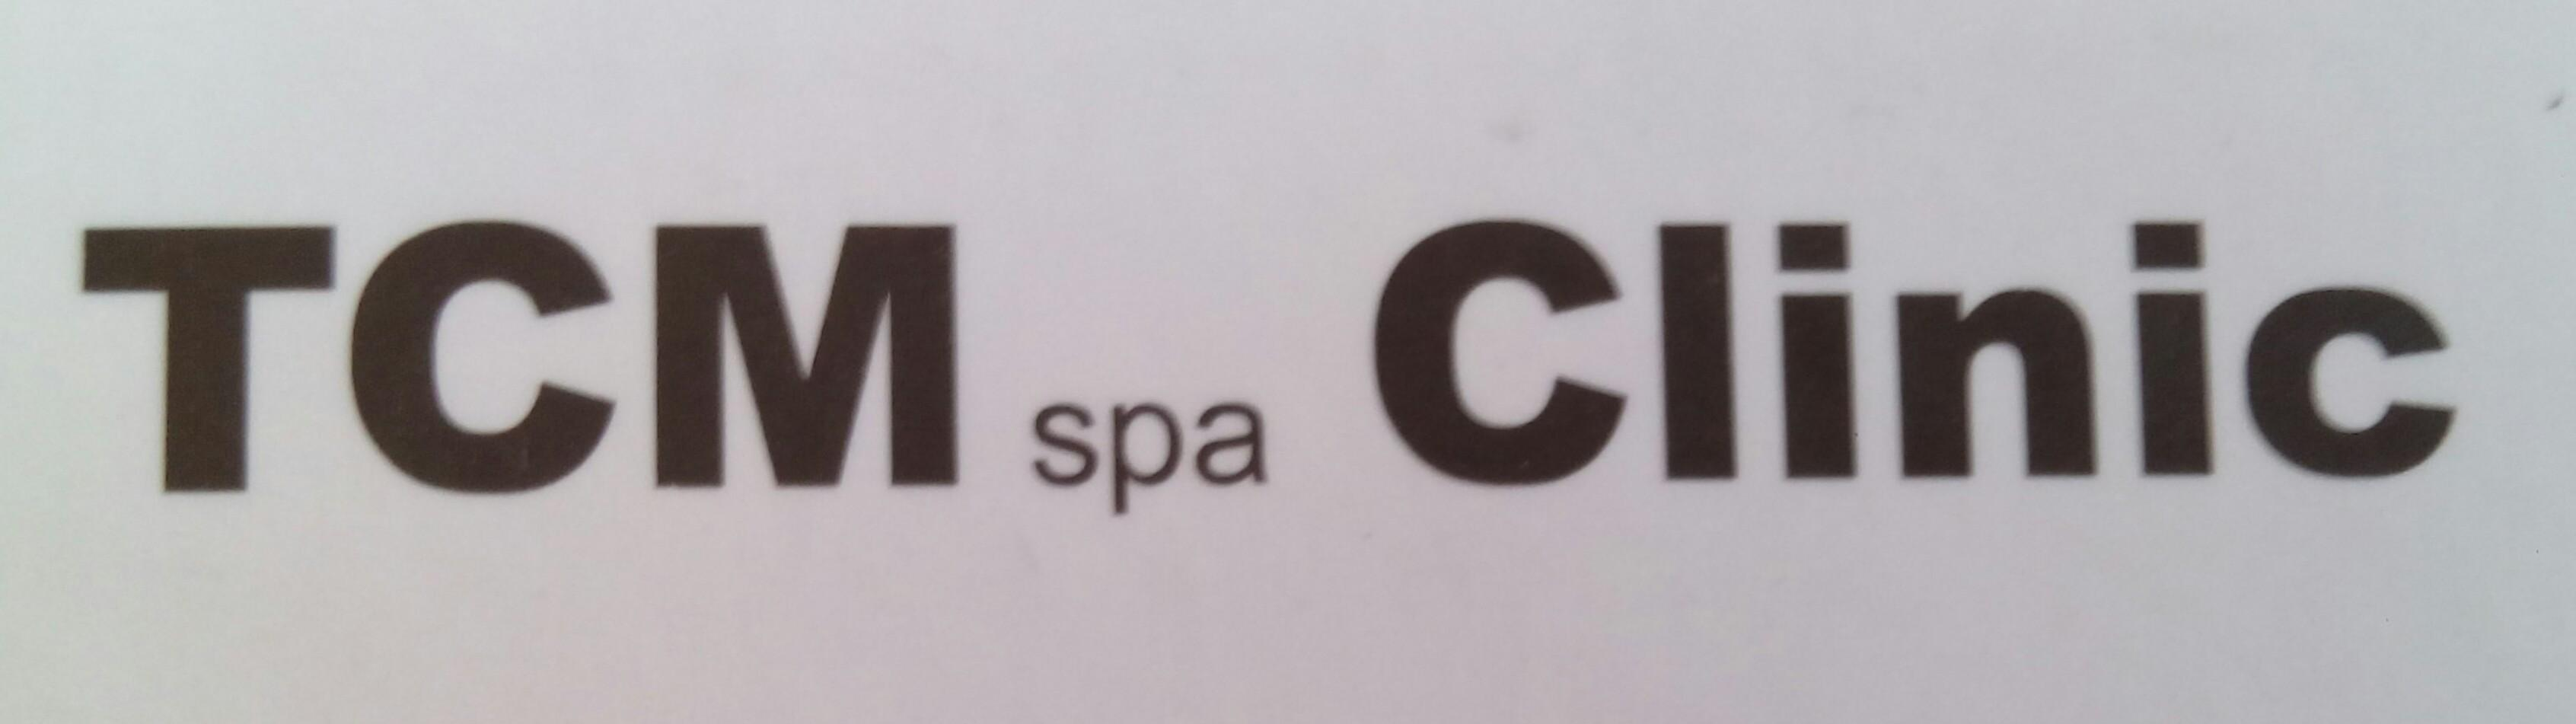 TCM Spa Clinic